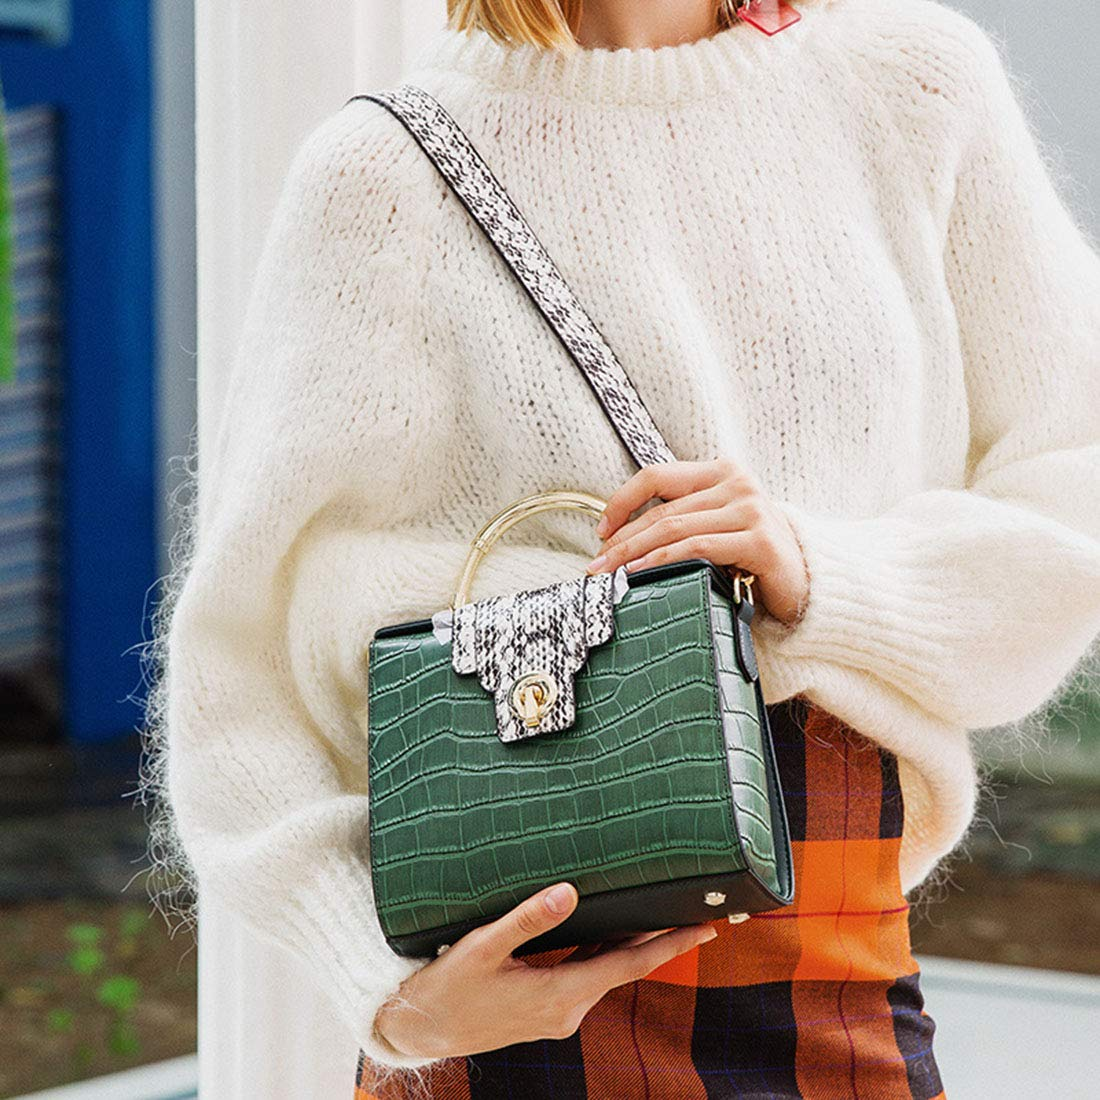 Green Carriemeow Simple Retro Lock Crocodile Kelly Bag Square Leather Shoulder Bag Messenger Bag Color : Wine red